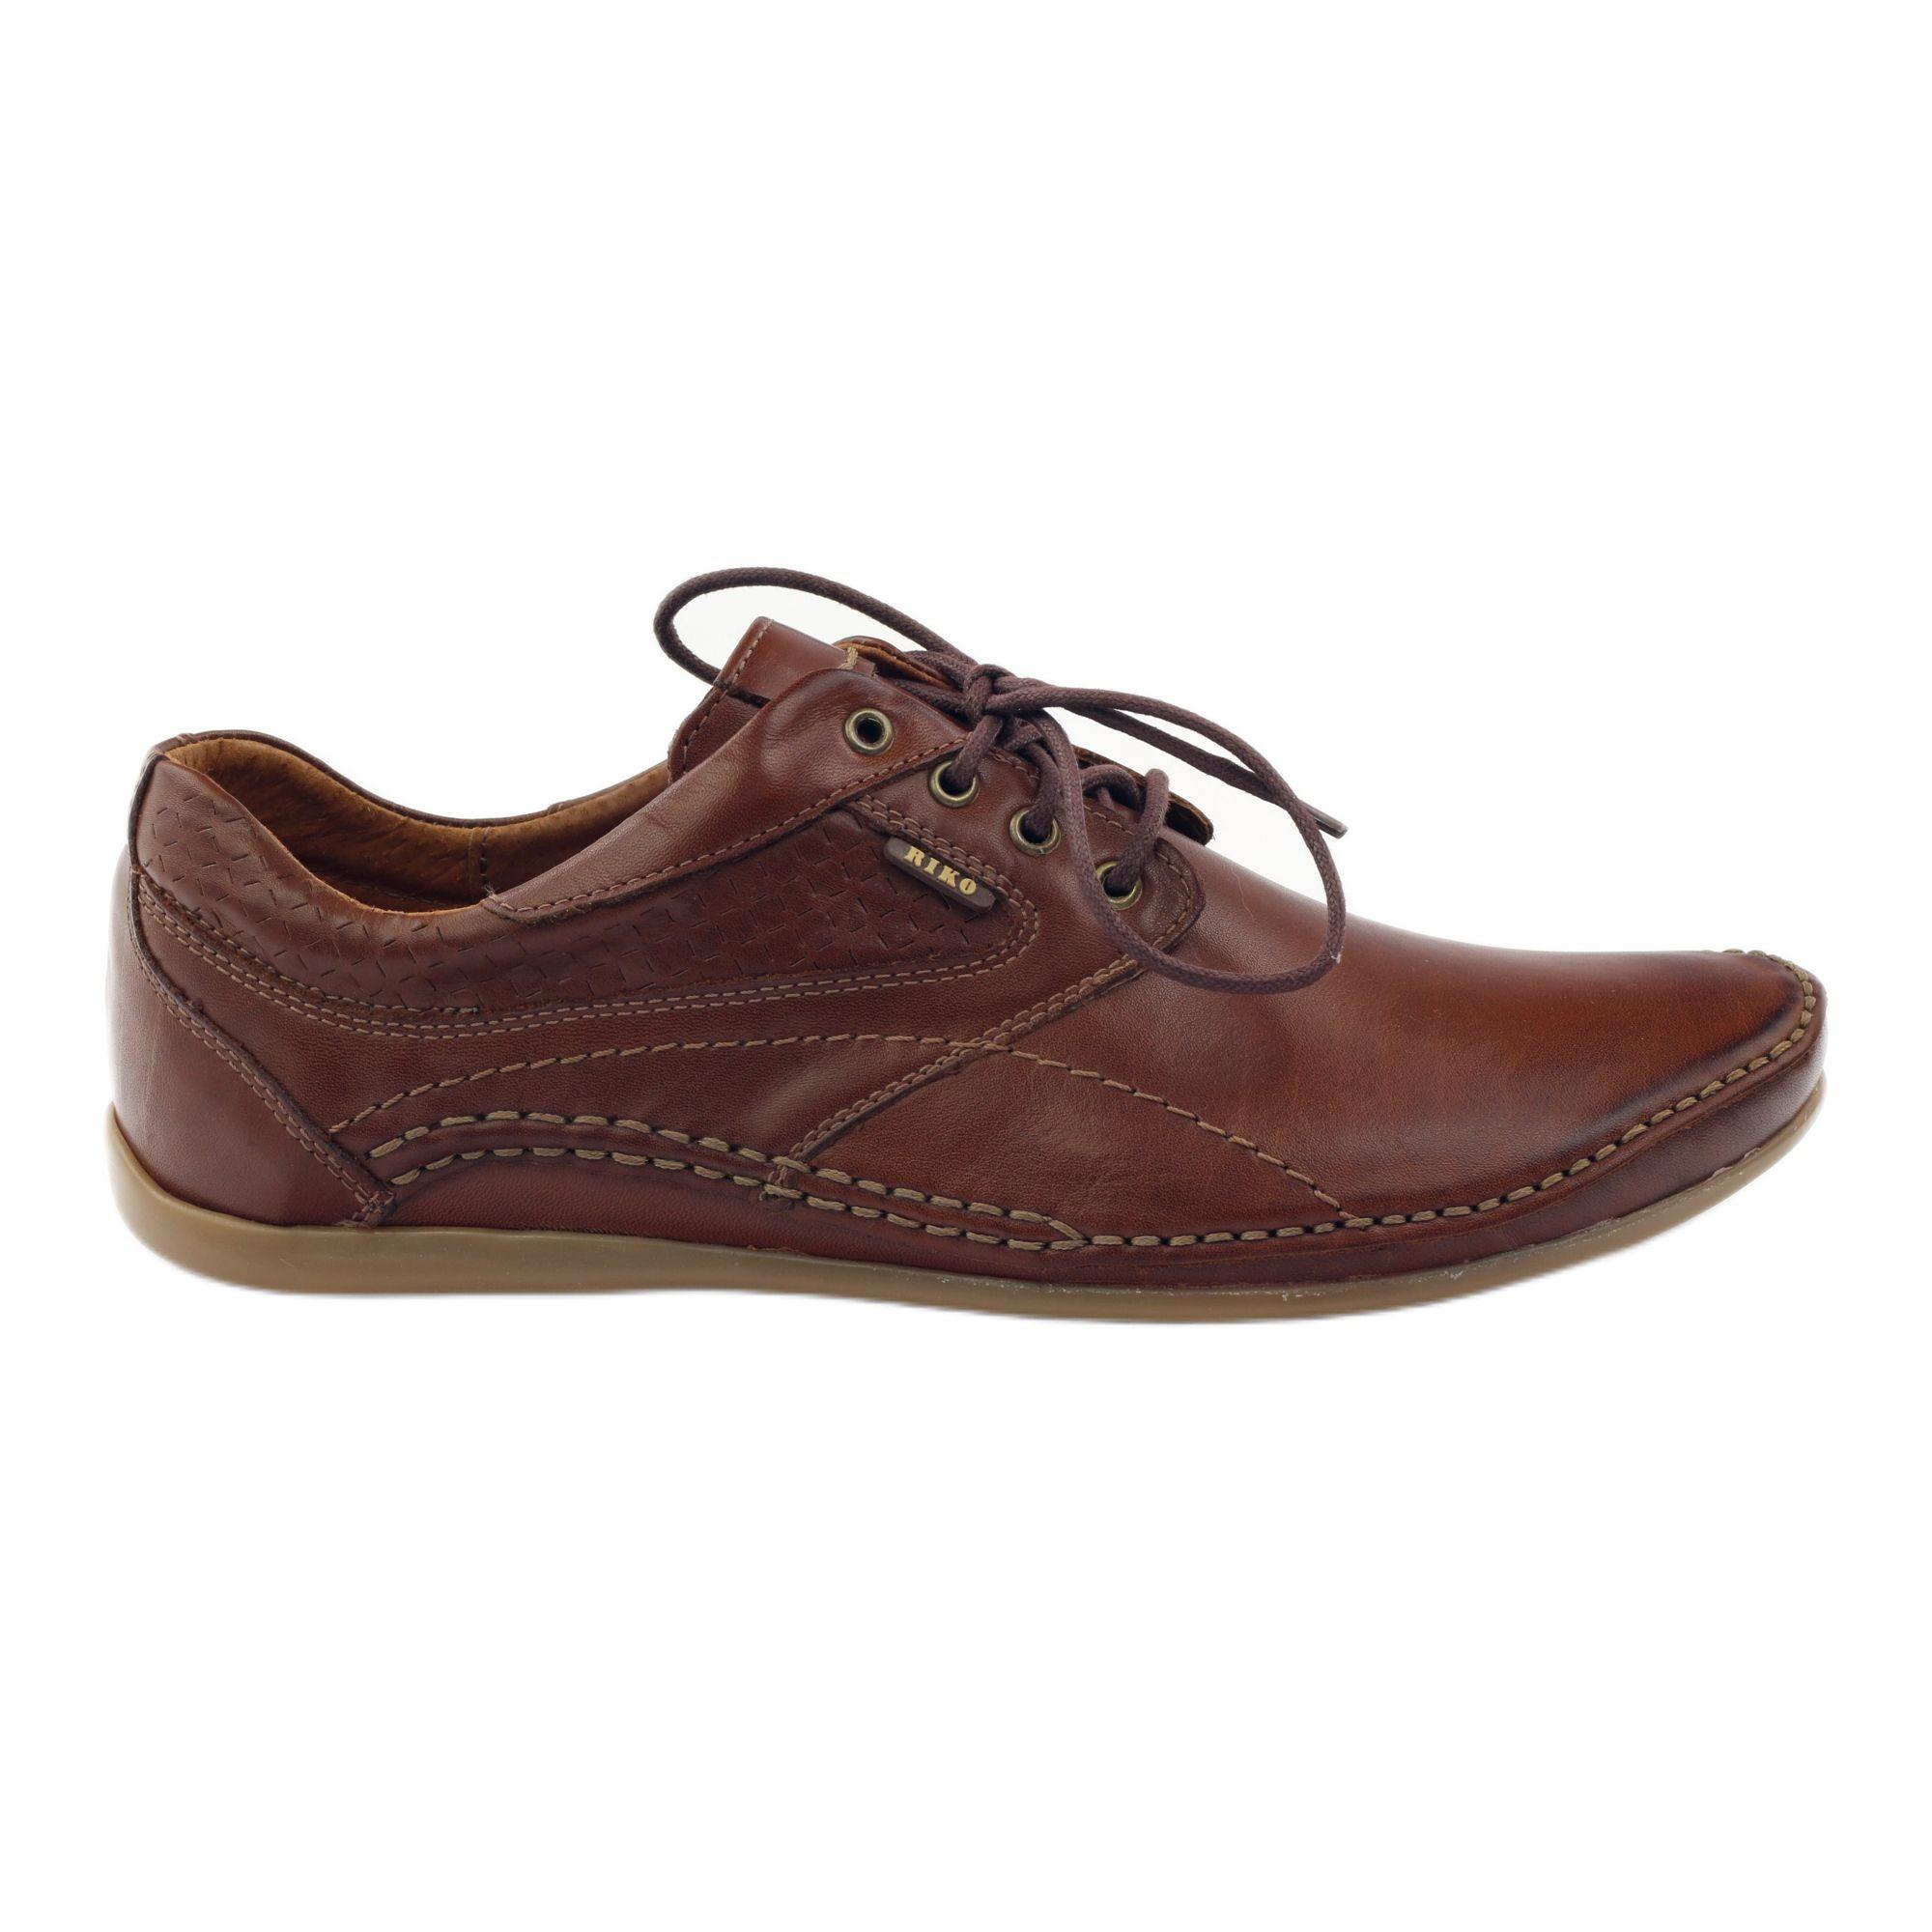 Brazowe Riko Buty Meskie Polbuty Casual 844 Mens Casual Shoes Mens Fashion Shoes Leather Shoes Men